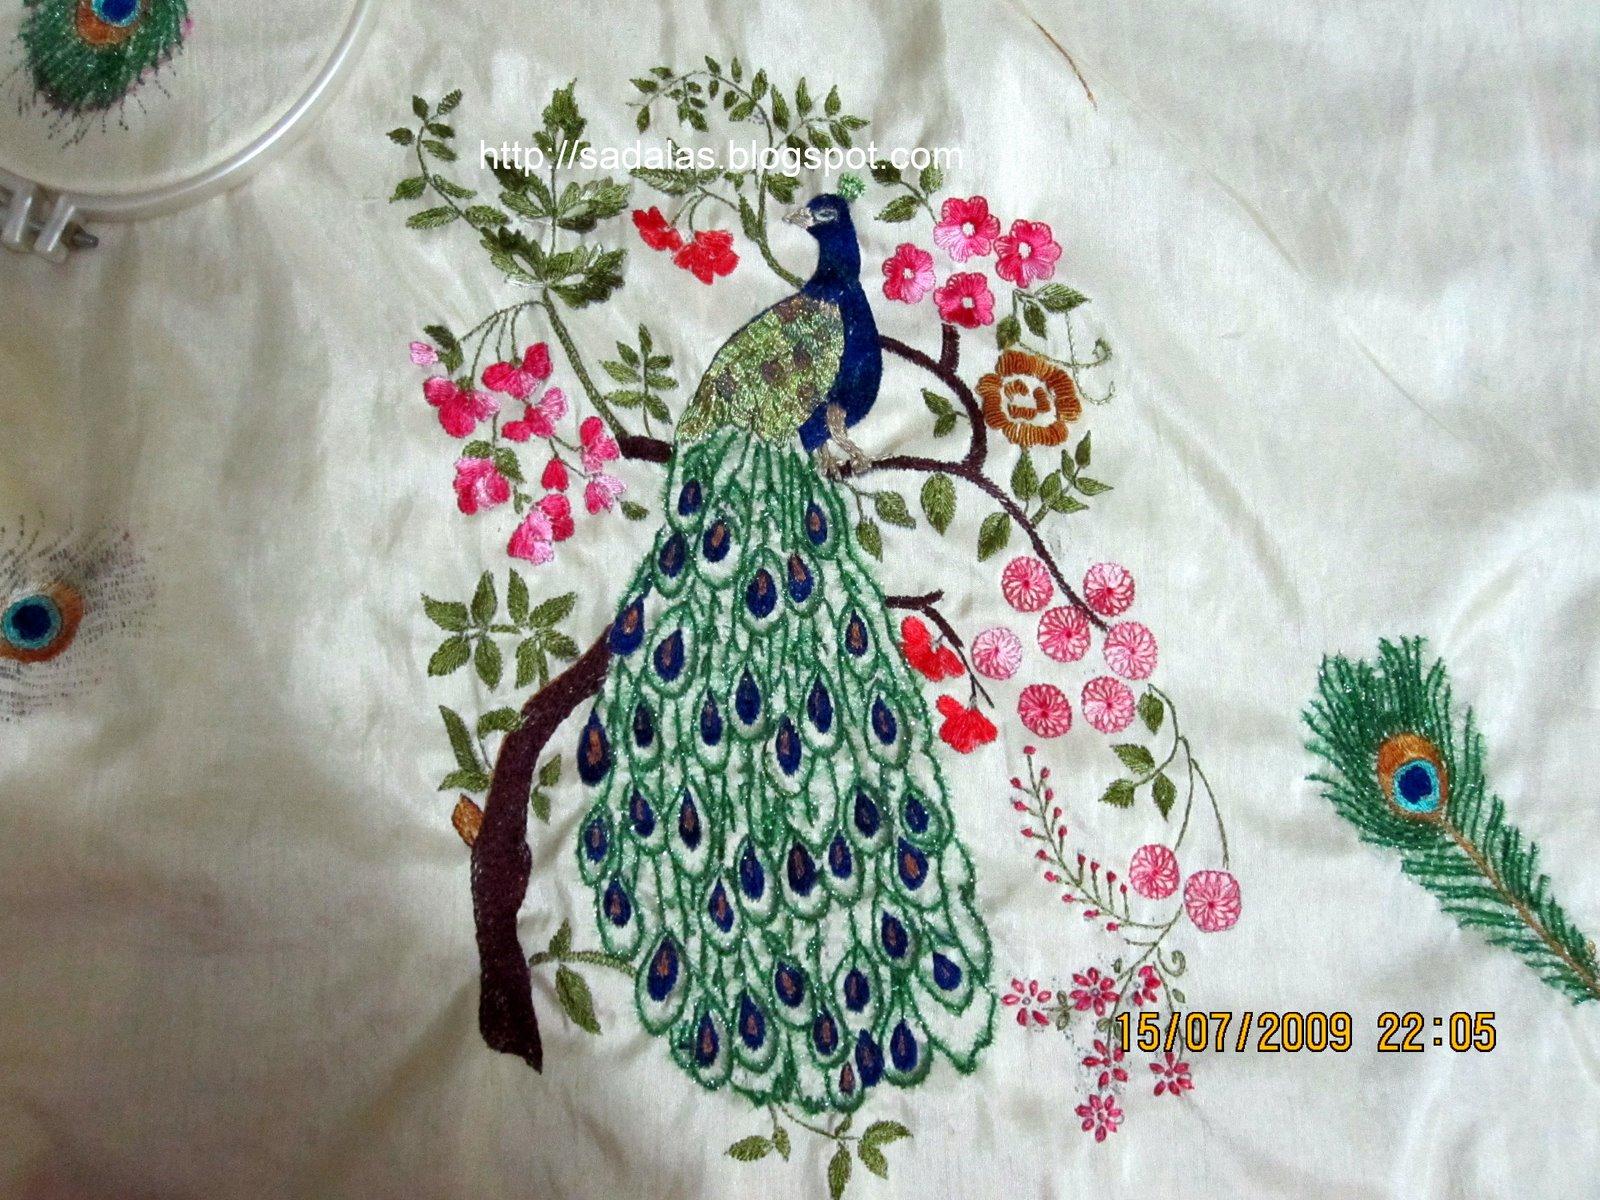 Sadala39s Embroidery Peacock 2